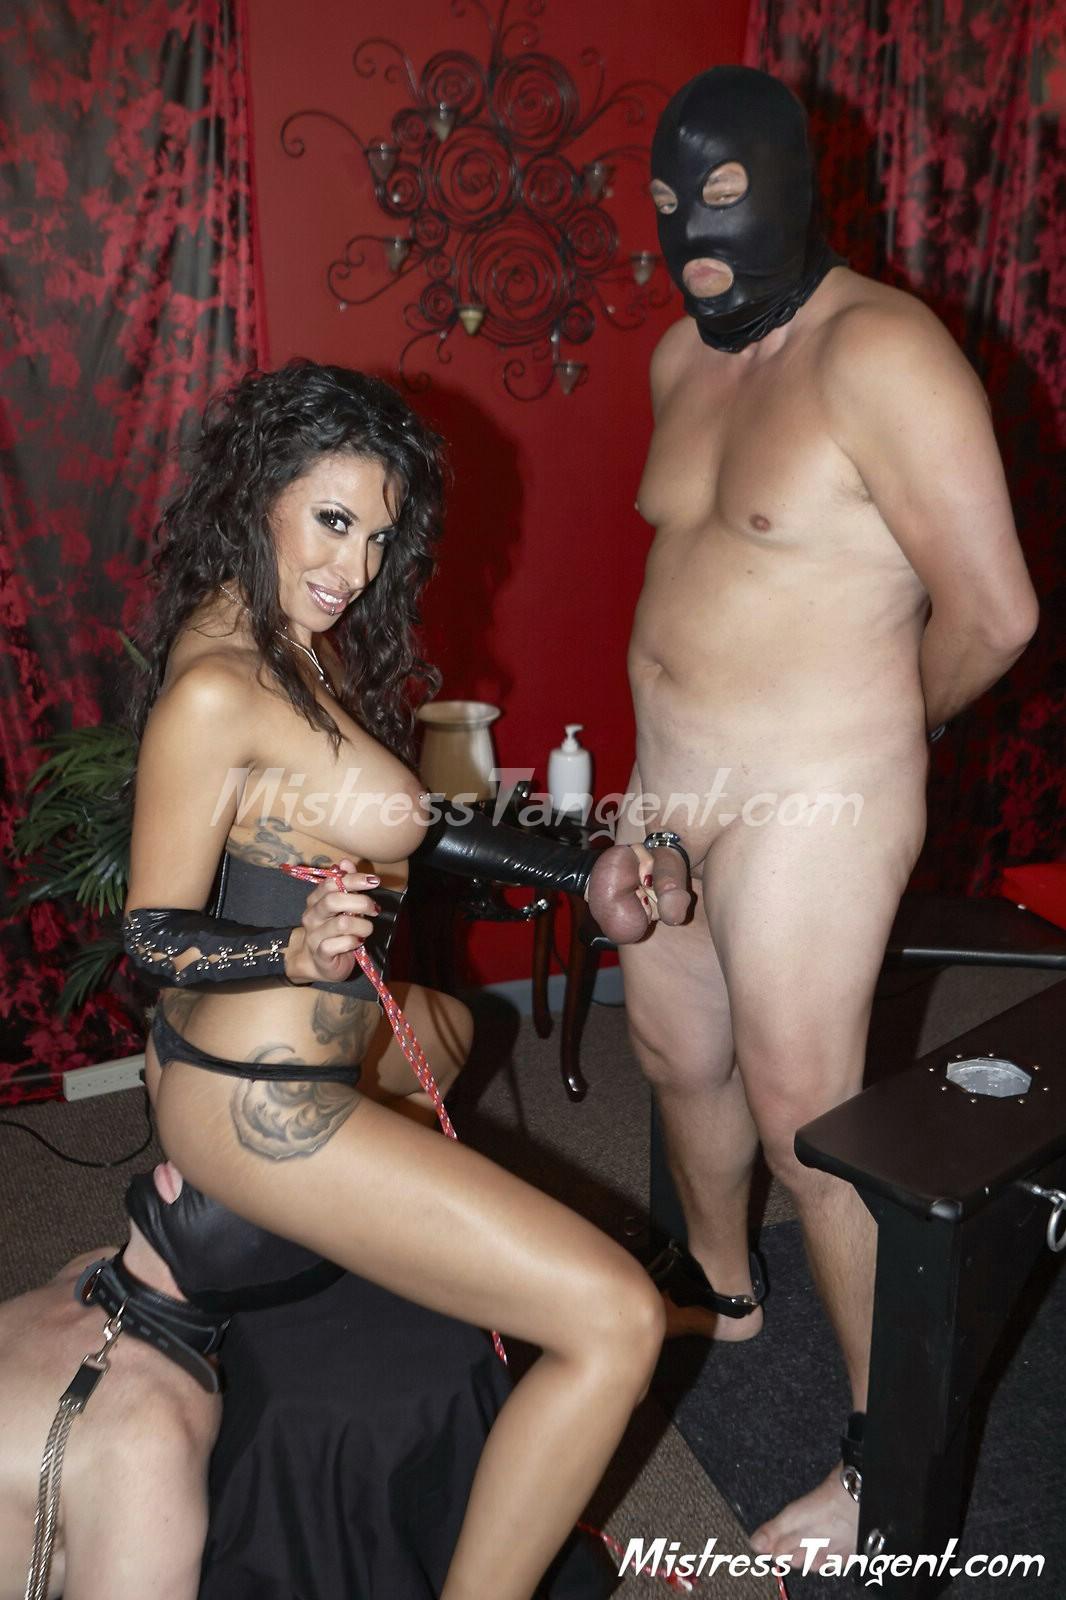 Bursting Bisex with Mistress Tangent